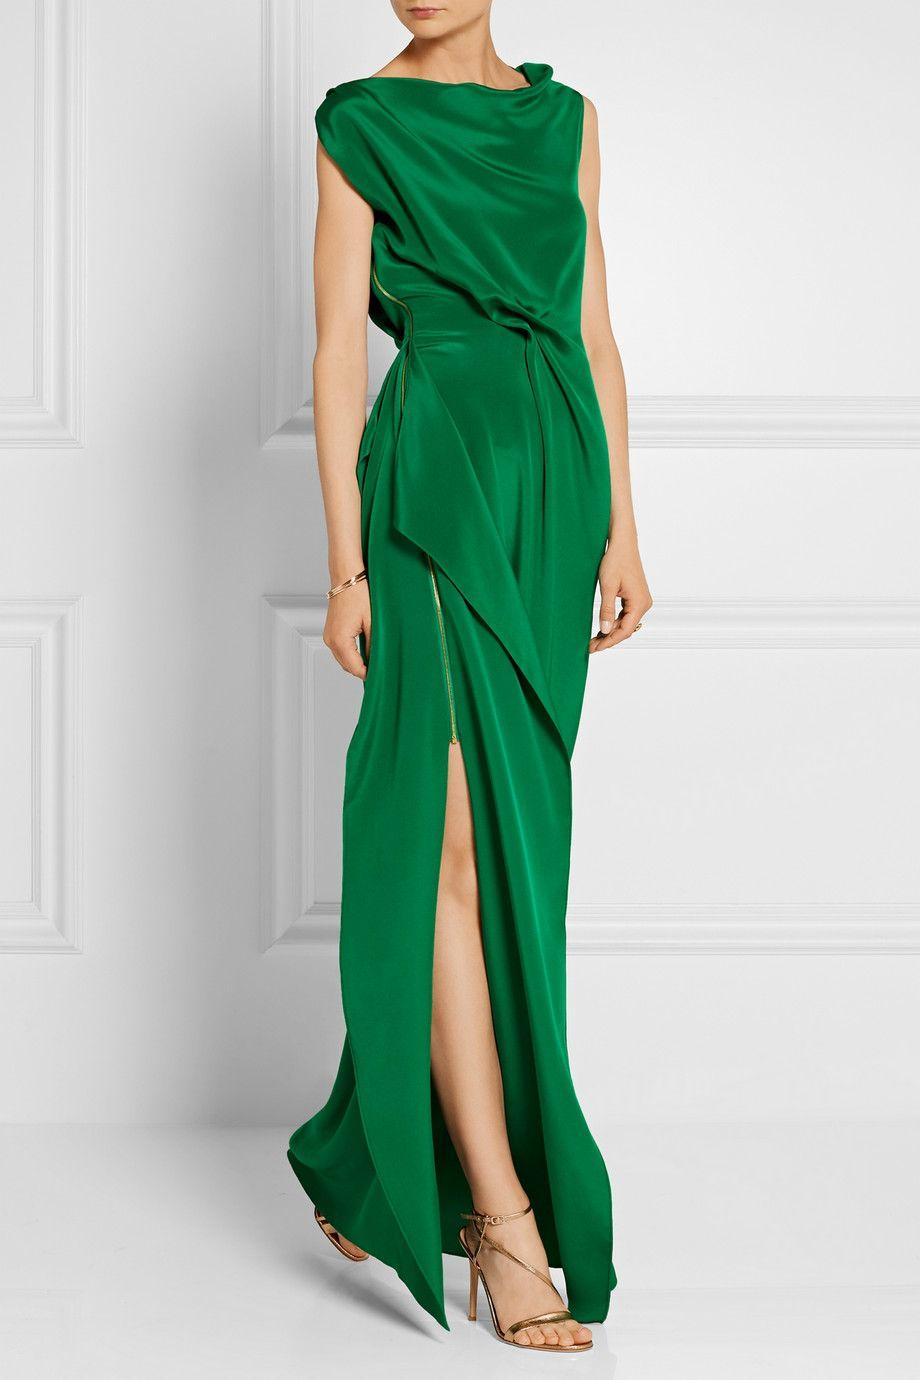 Roland Mouret Goodard Gathered Silk Crepe De Chine Gown